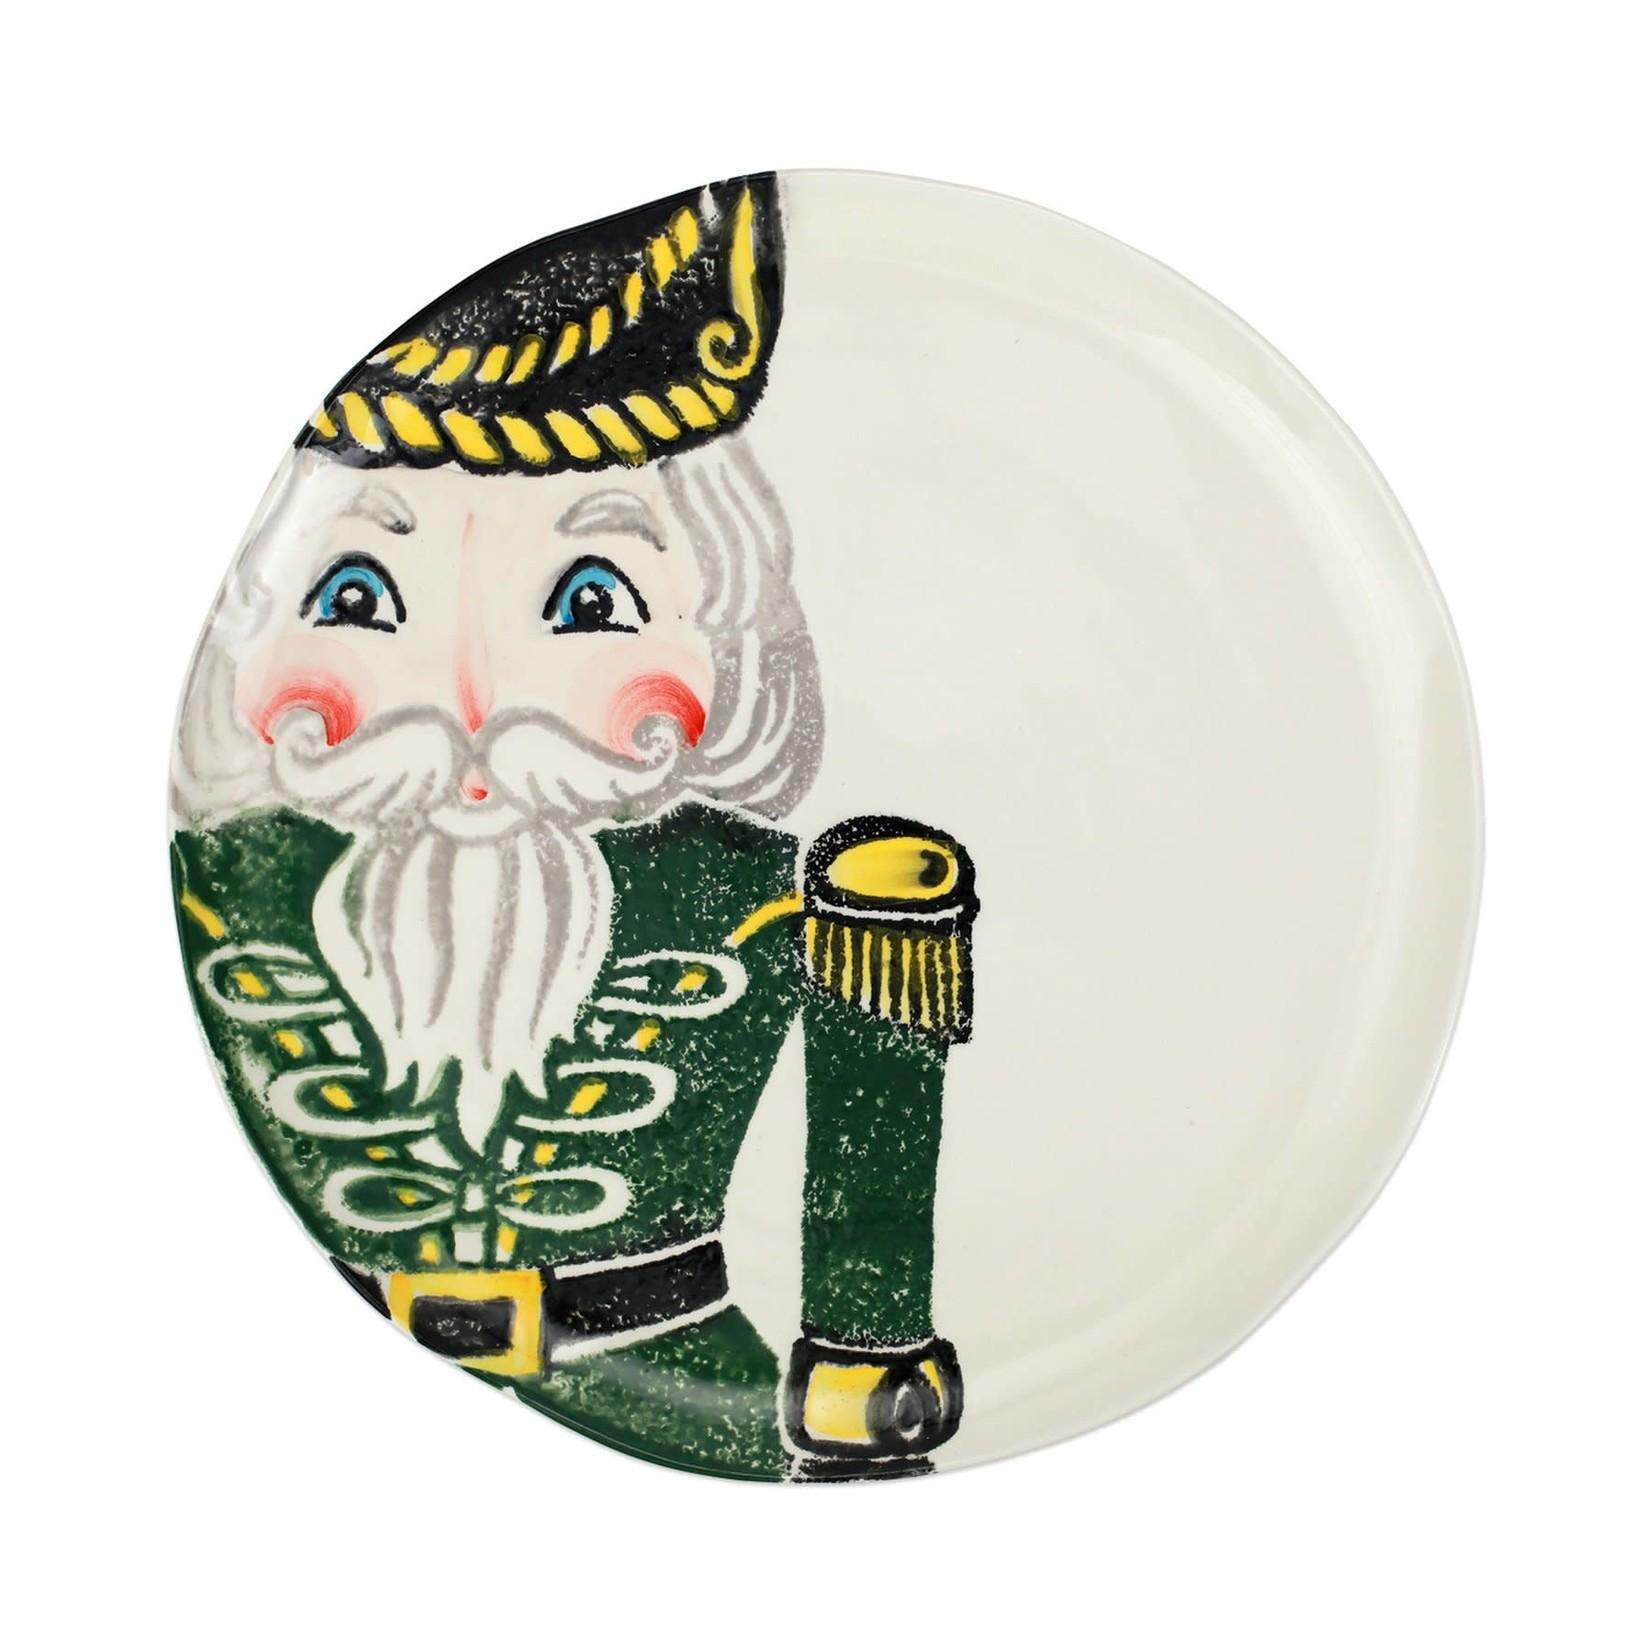 Nutcracker Dinner Green